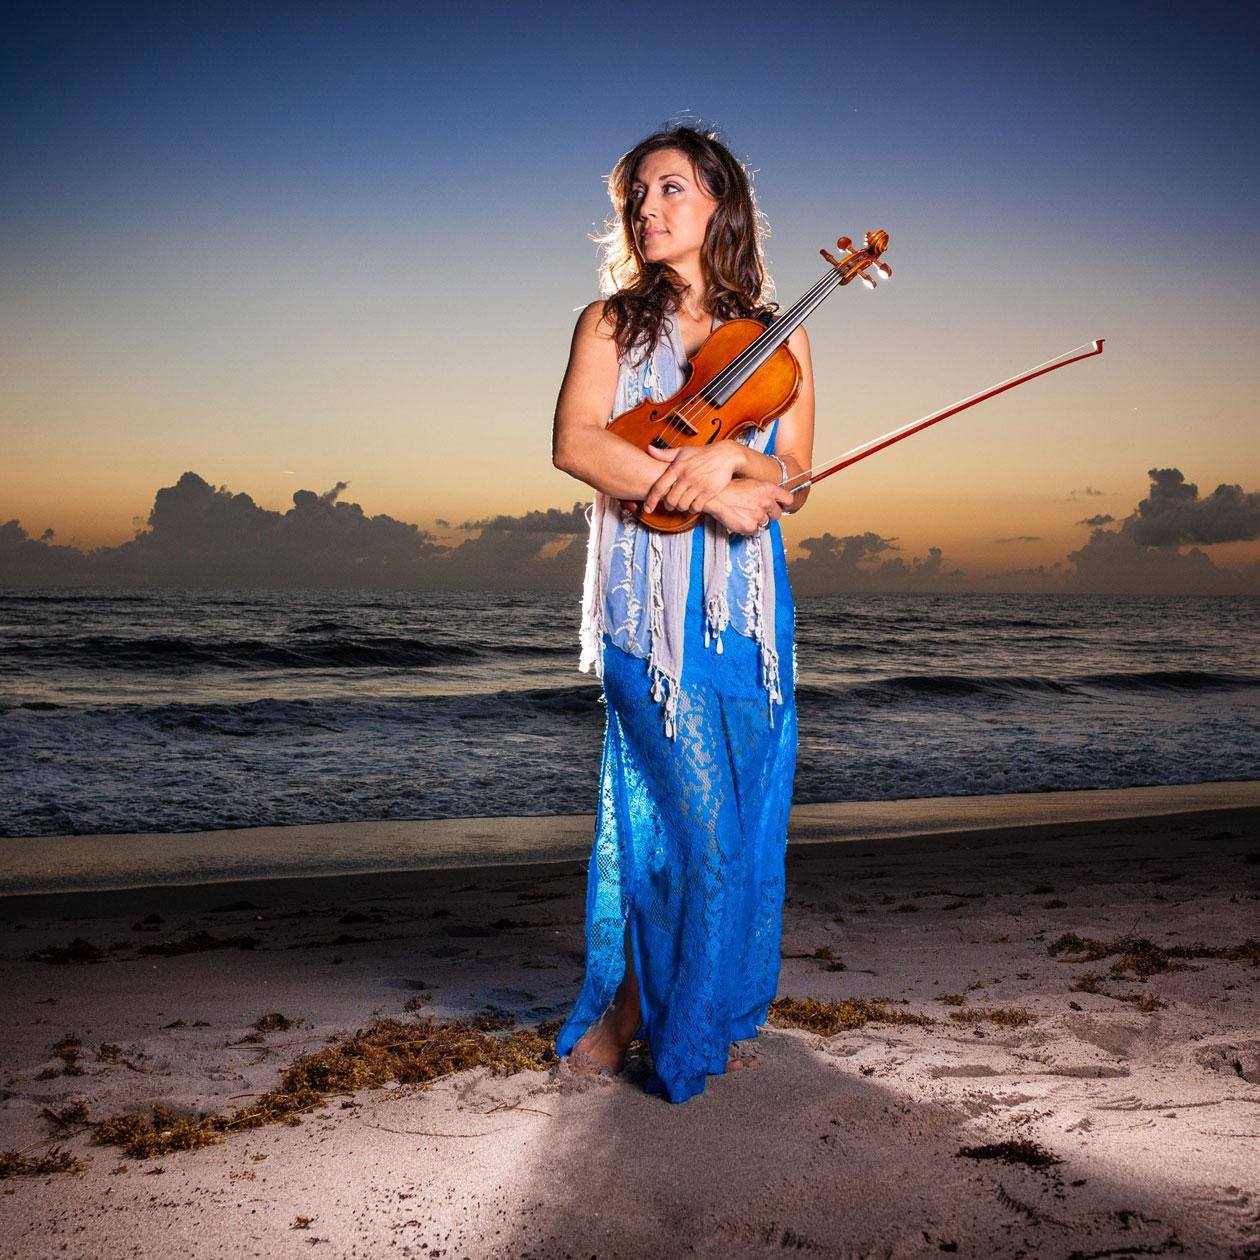 Mariana Sunset Violinist #7